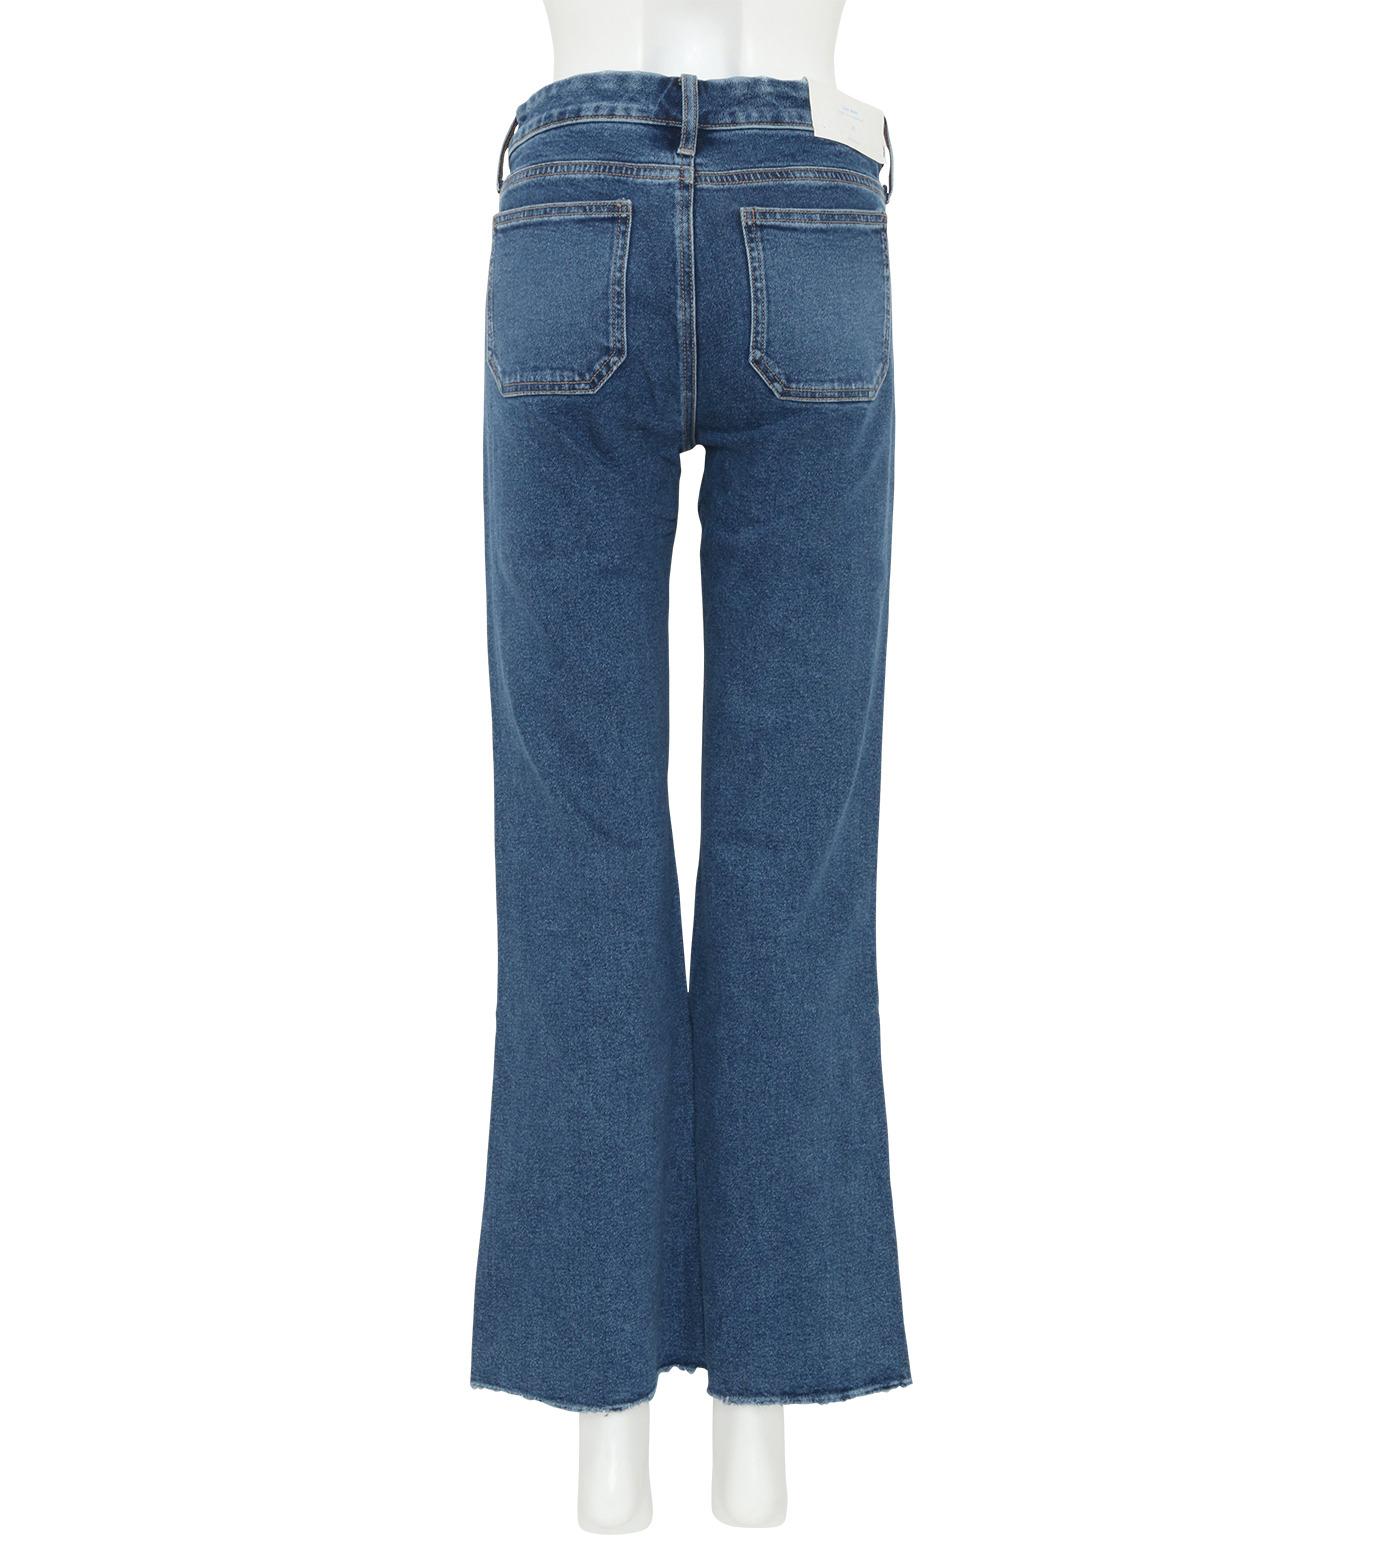 M.i.h Jeans(エムアイエイチジーンズ)のLou Flare Denim-LIGHT BLUE(デニム/denim)-W2102175-91 拡大詳細画像2